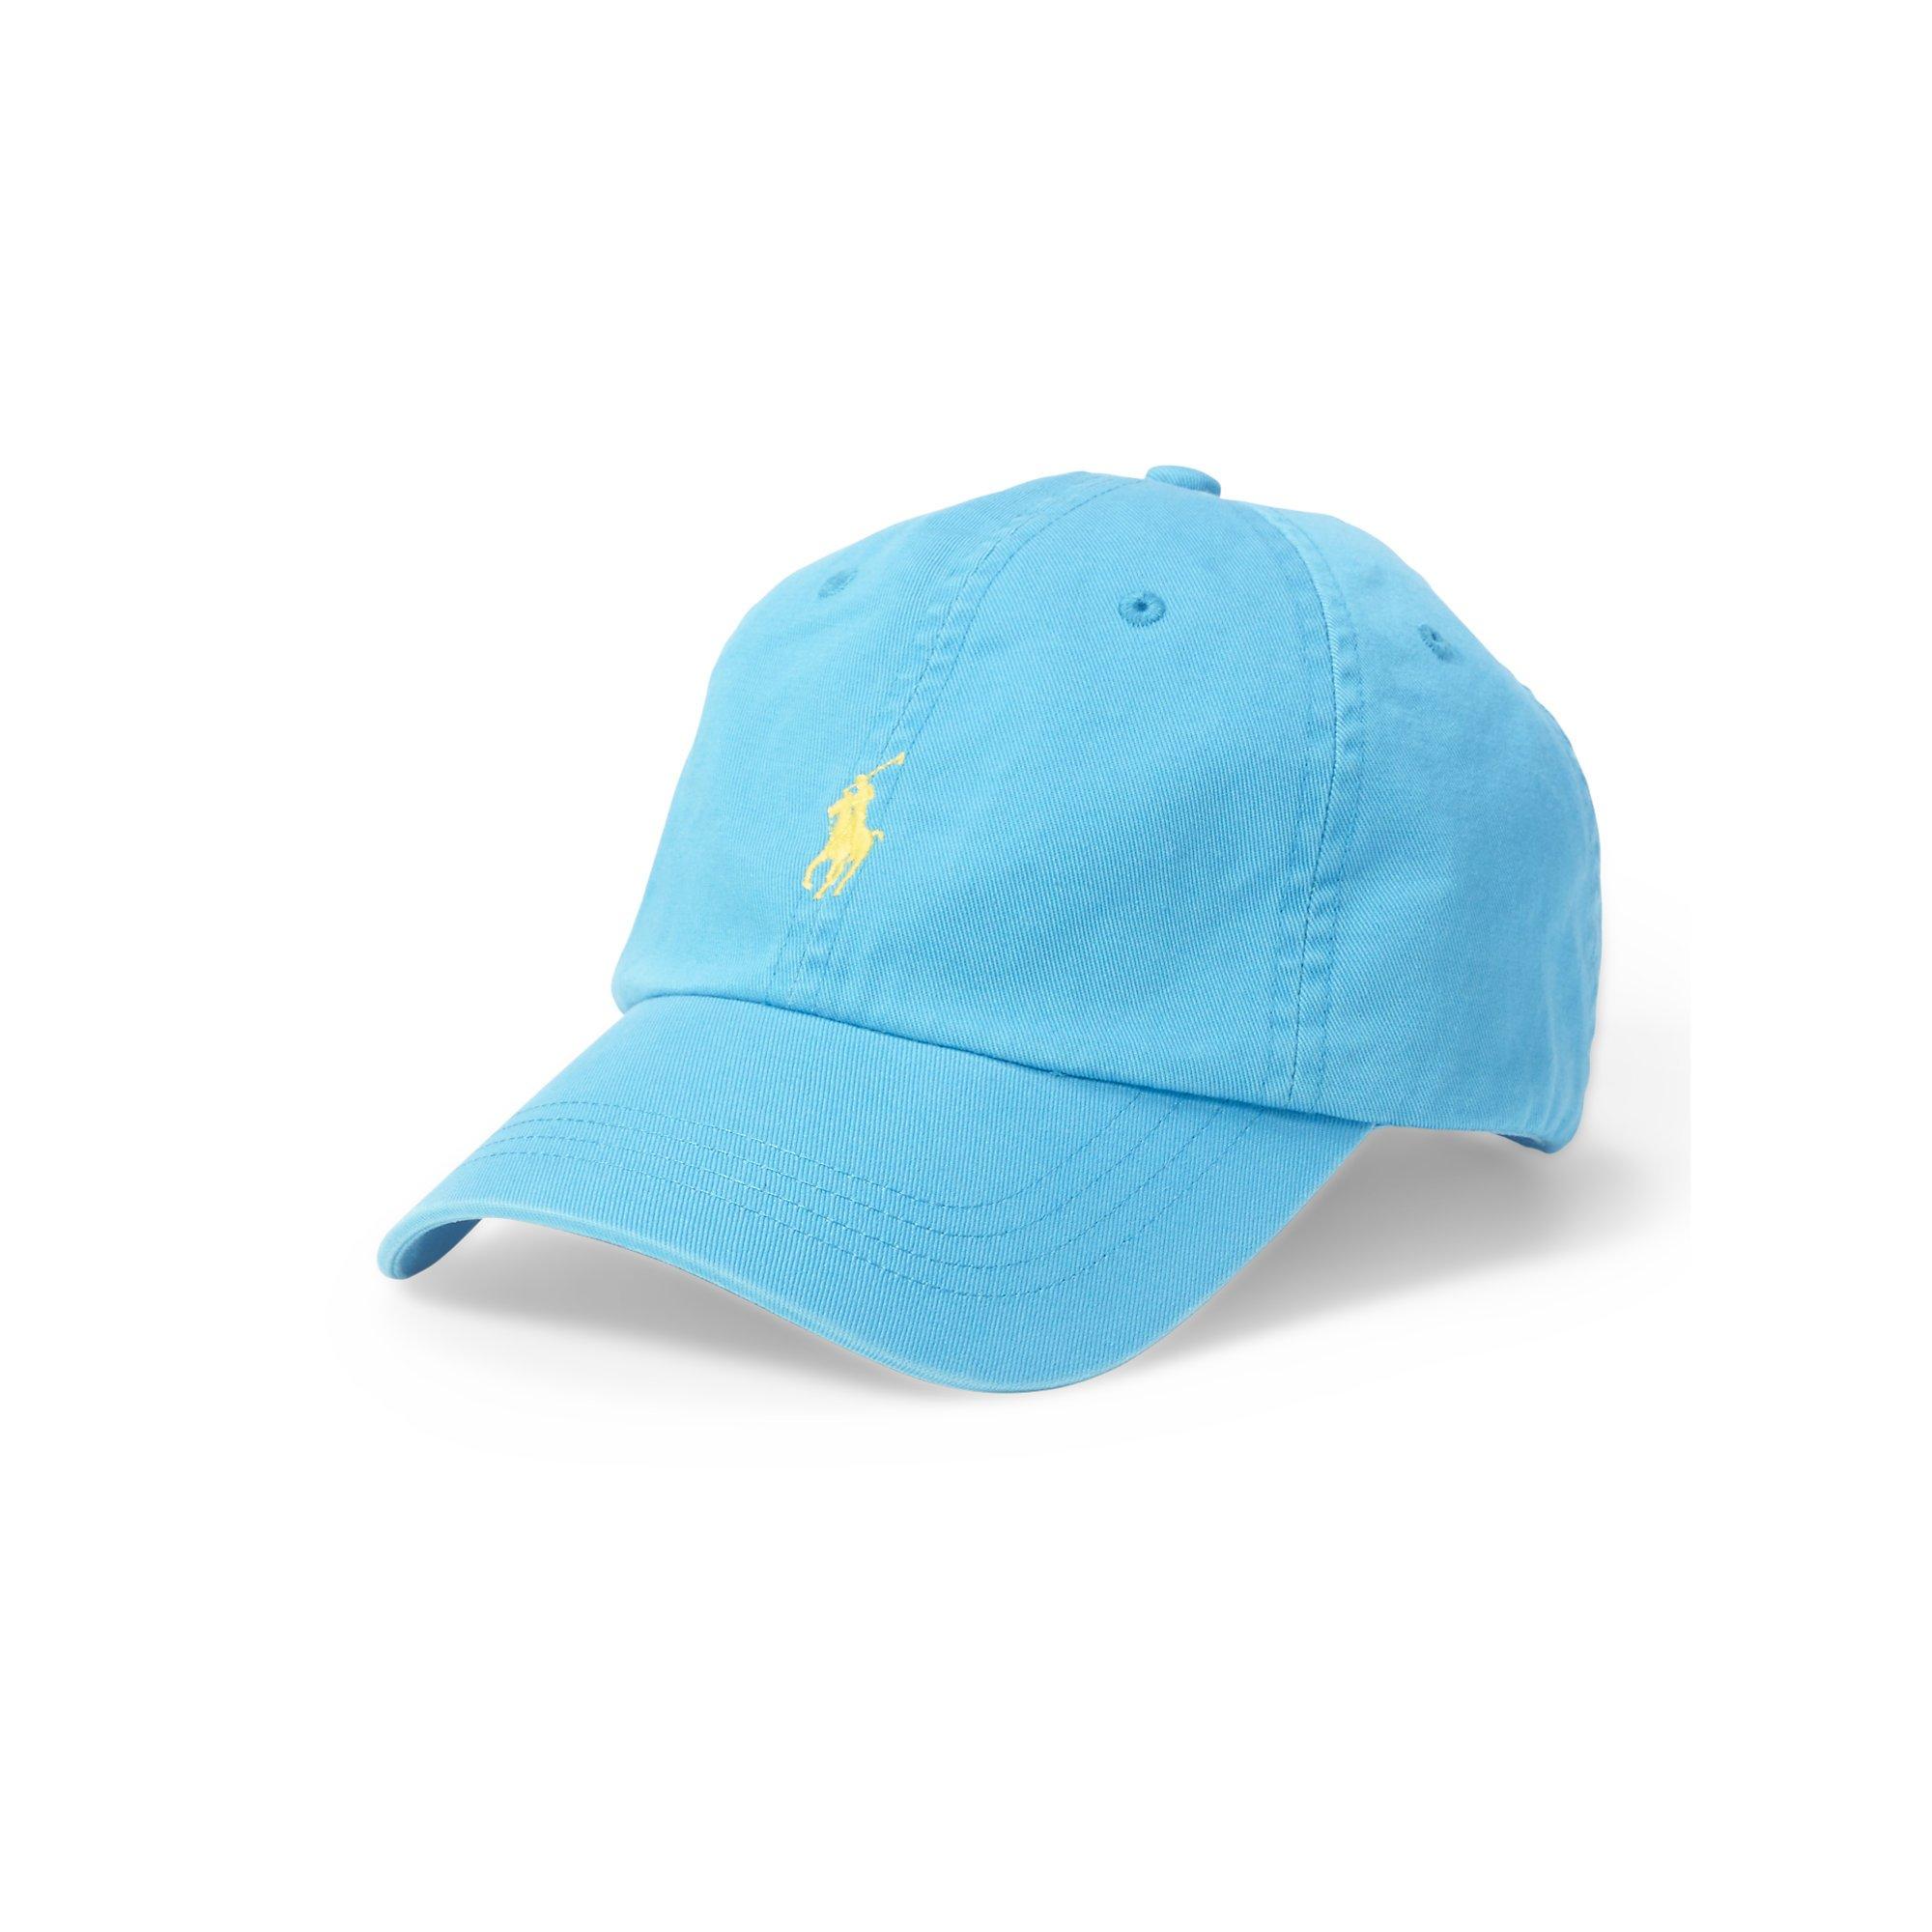 11f90f4b ... get lyst polo ralph lauren cotton chino baseball cap in blue for men  121ed 2c591